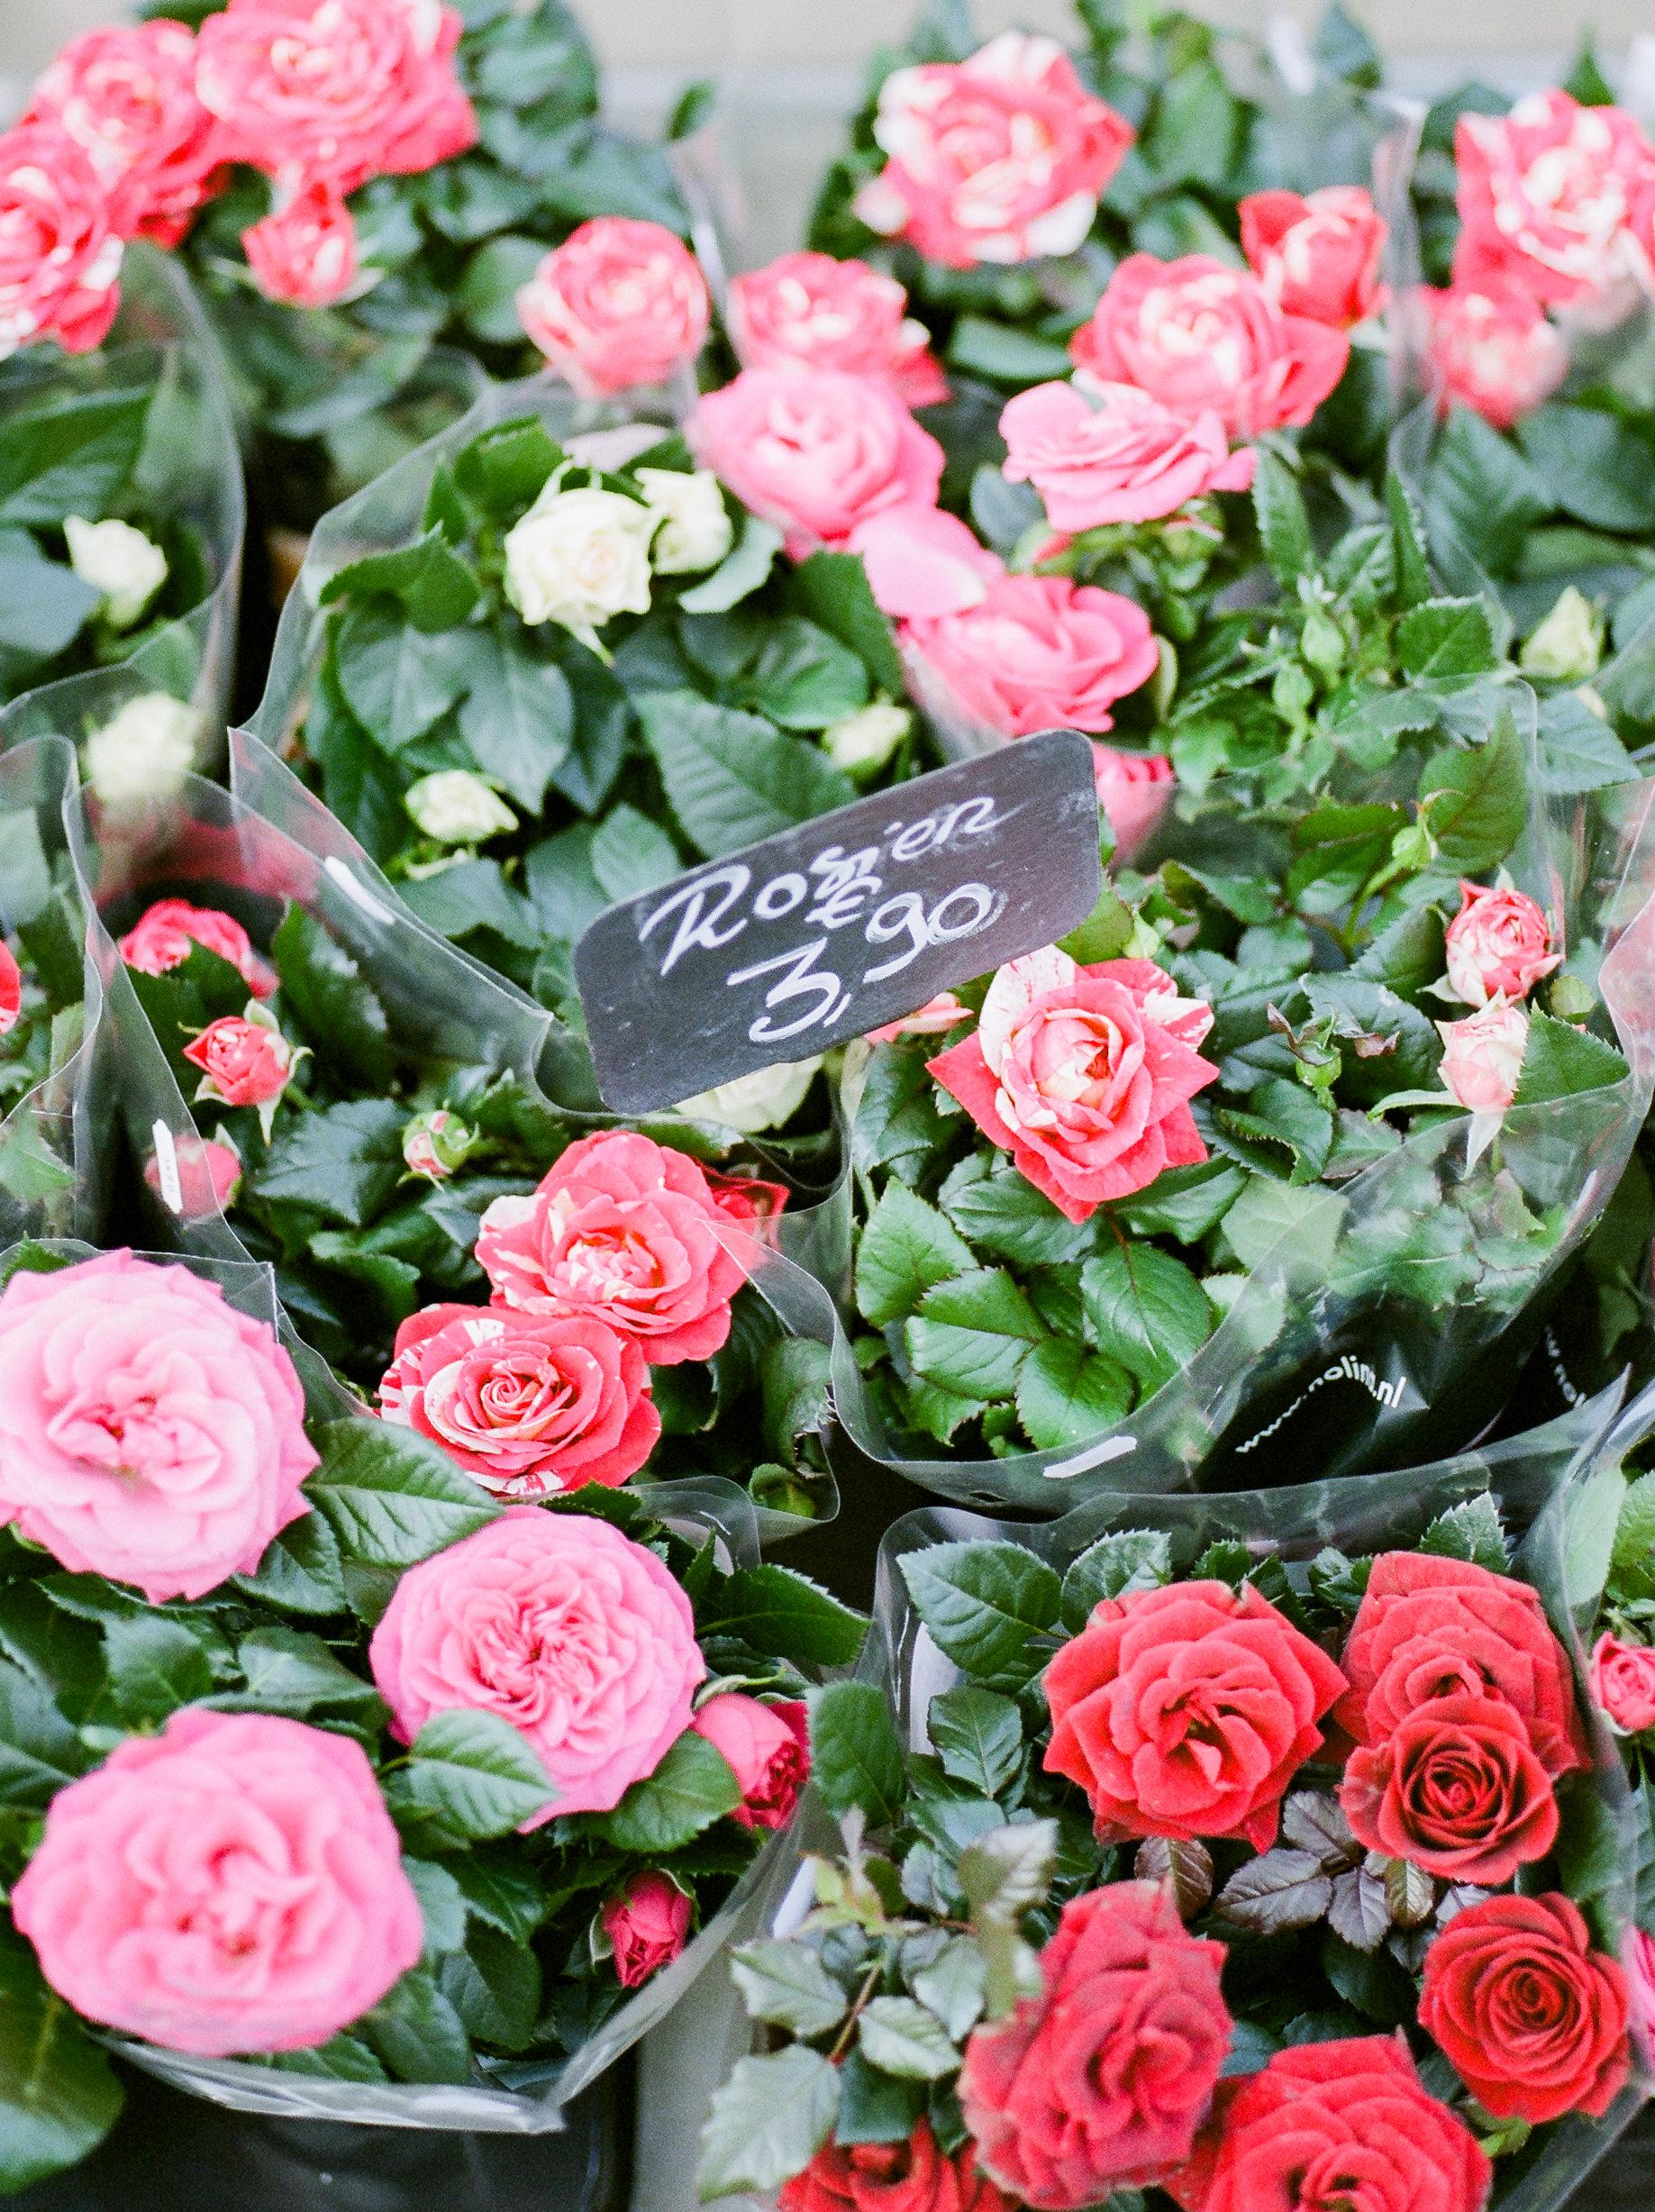 fresh-flowers-in-market-during-the-winter-in-paris.jpg